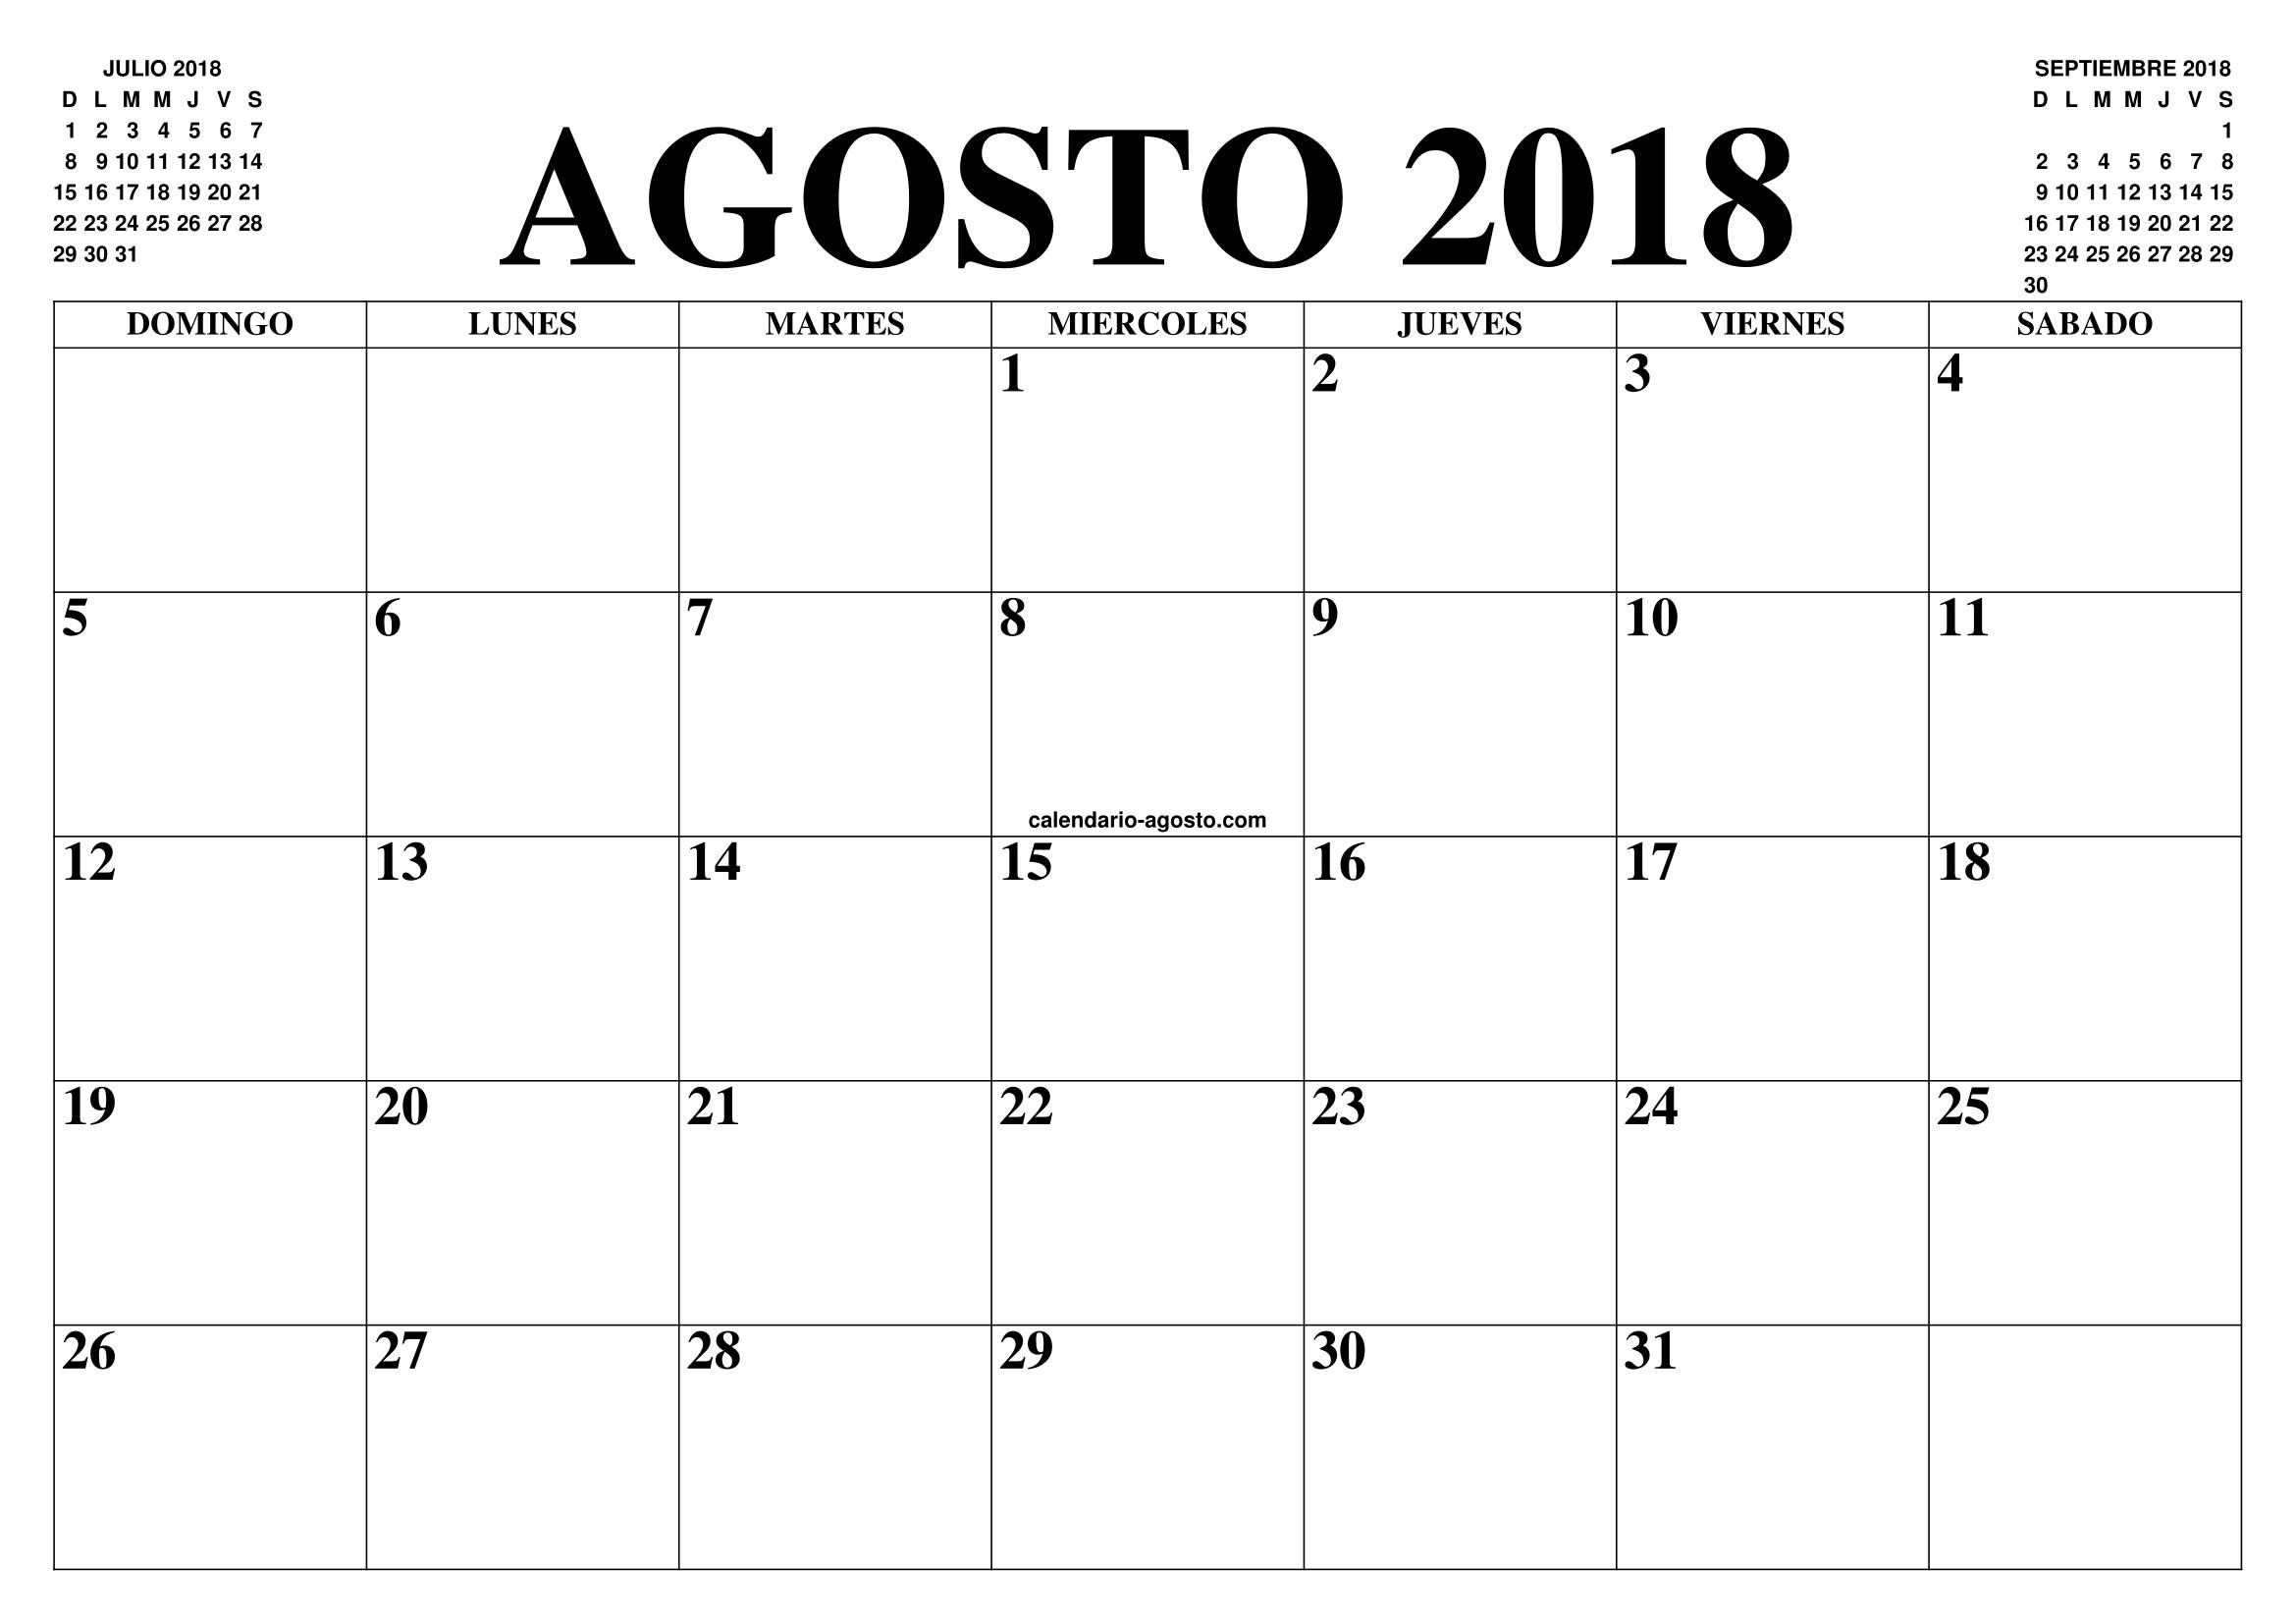 Calendario 2019 Argentina Para Imprimir Excel Actual Calendario Agosto 2018 Para Imprimir Kordurorddiner Of Calendario 2019 Argentina Para Imprimir Excel Más Arriba-a-fecha formato De Calendarios Kordurorddiner